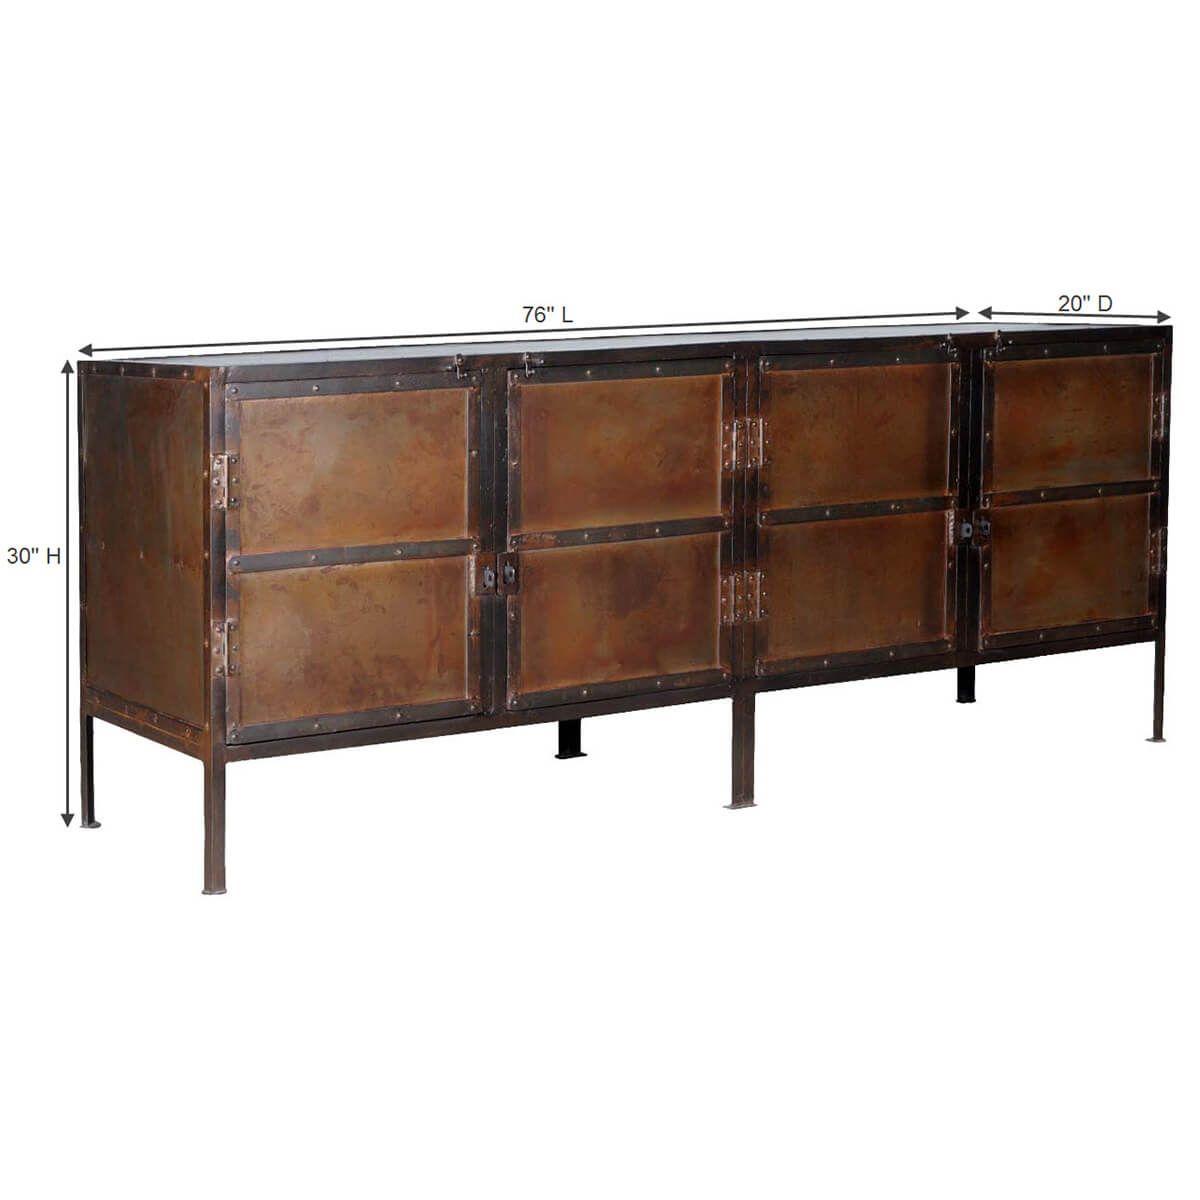 Industrial Black And Brown Iron 76 4 Door Large Buffet Cabinet Sideboard Cabinet Large Sideboard Cabinet Large Sideboard